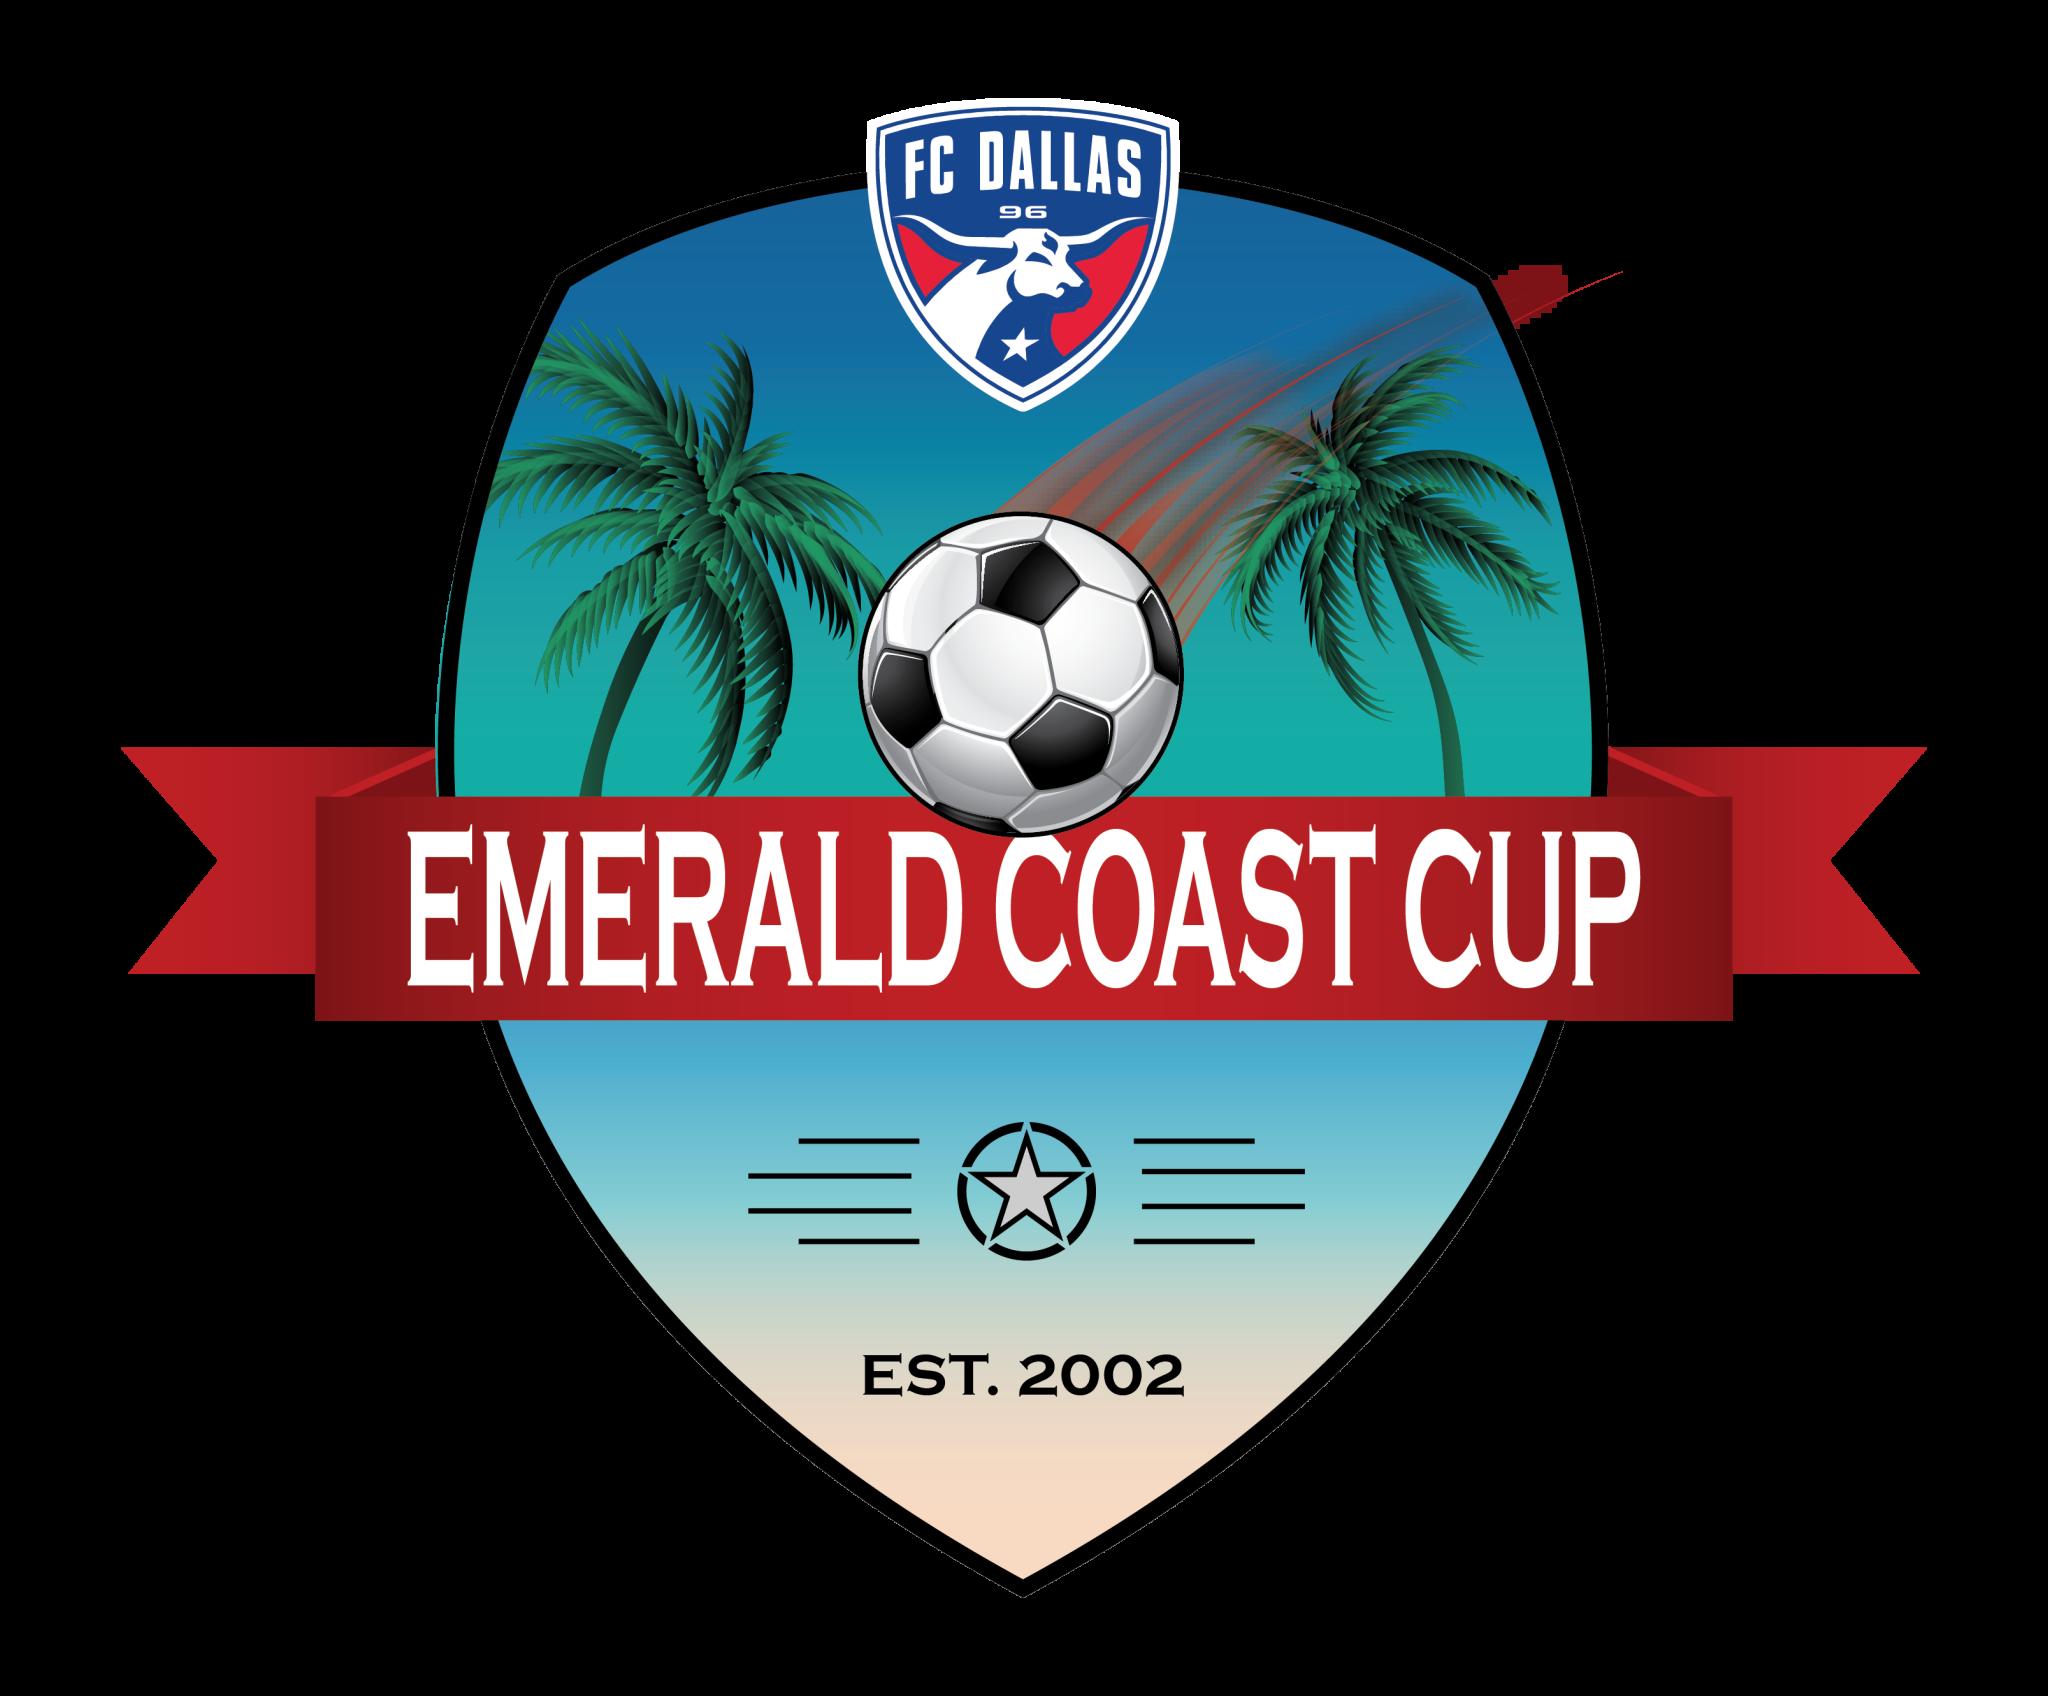 Emerald Coast Cup